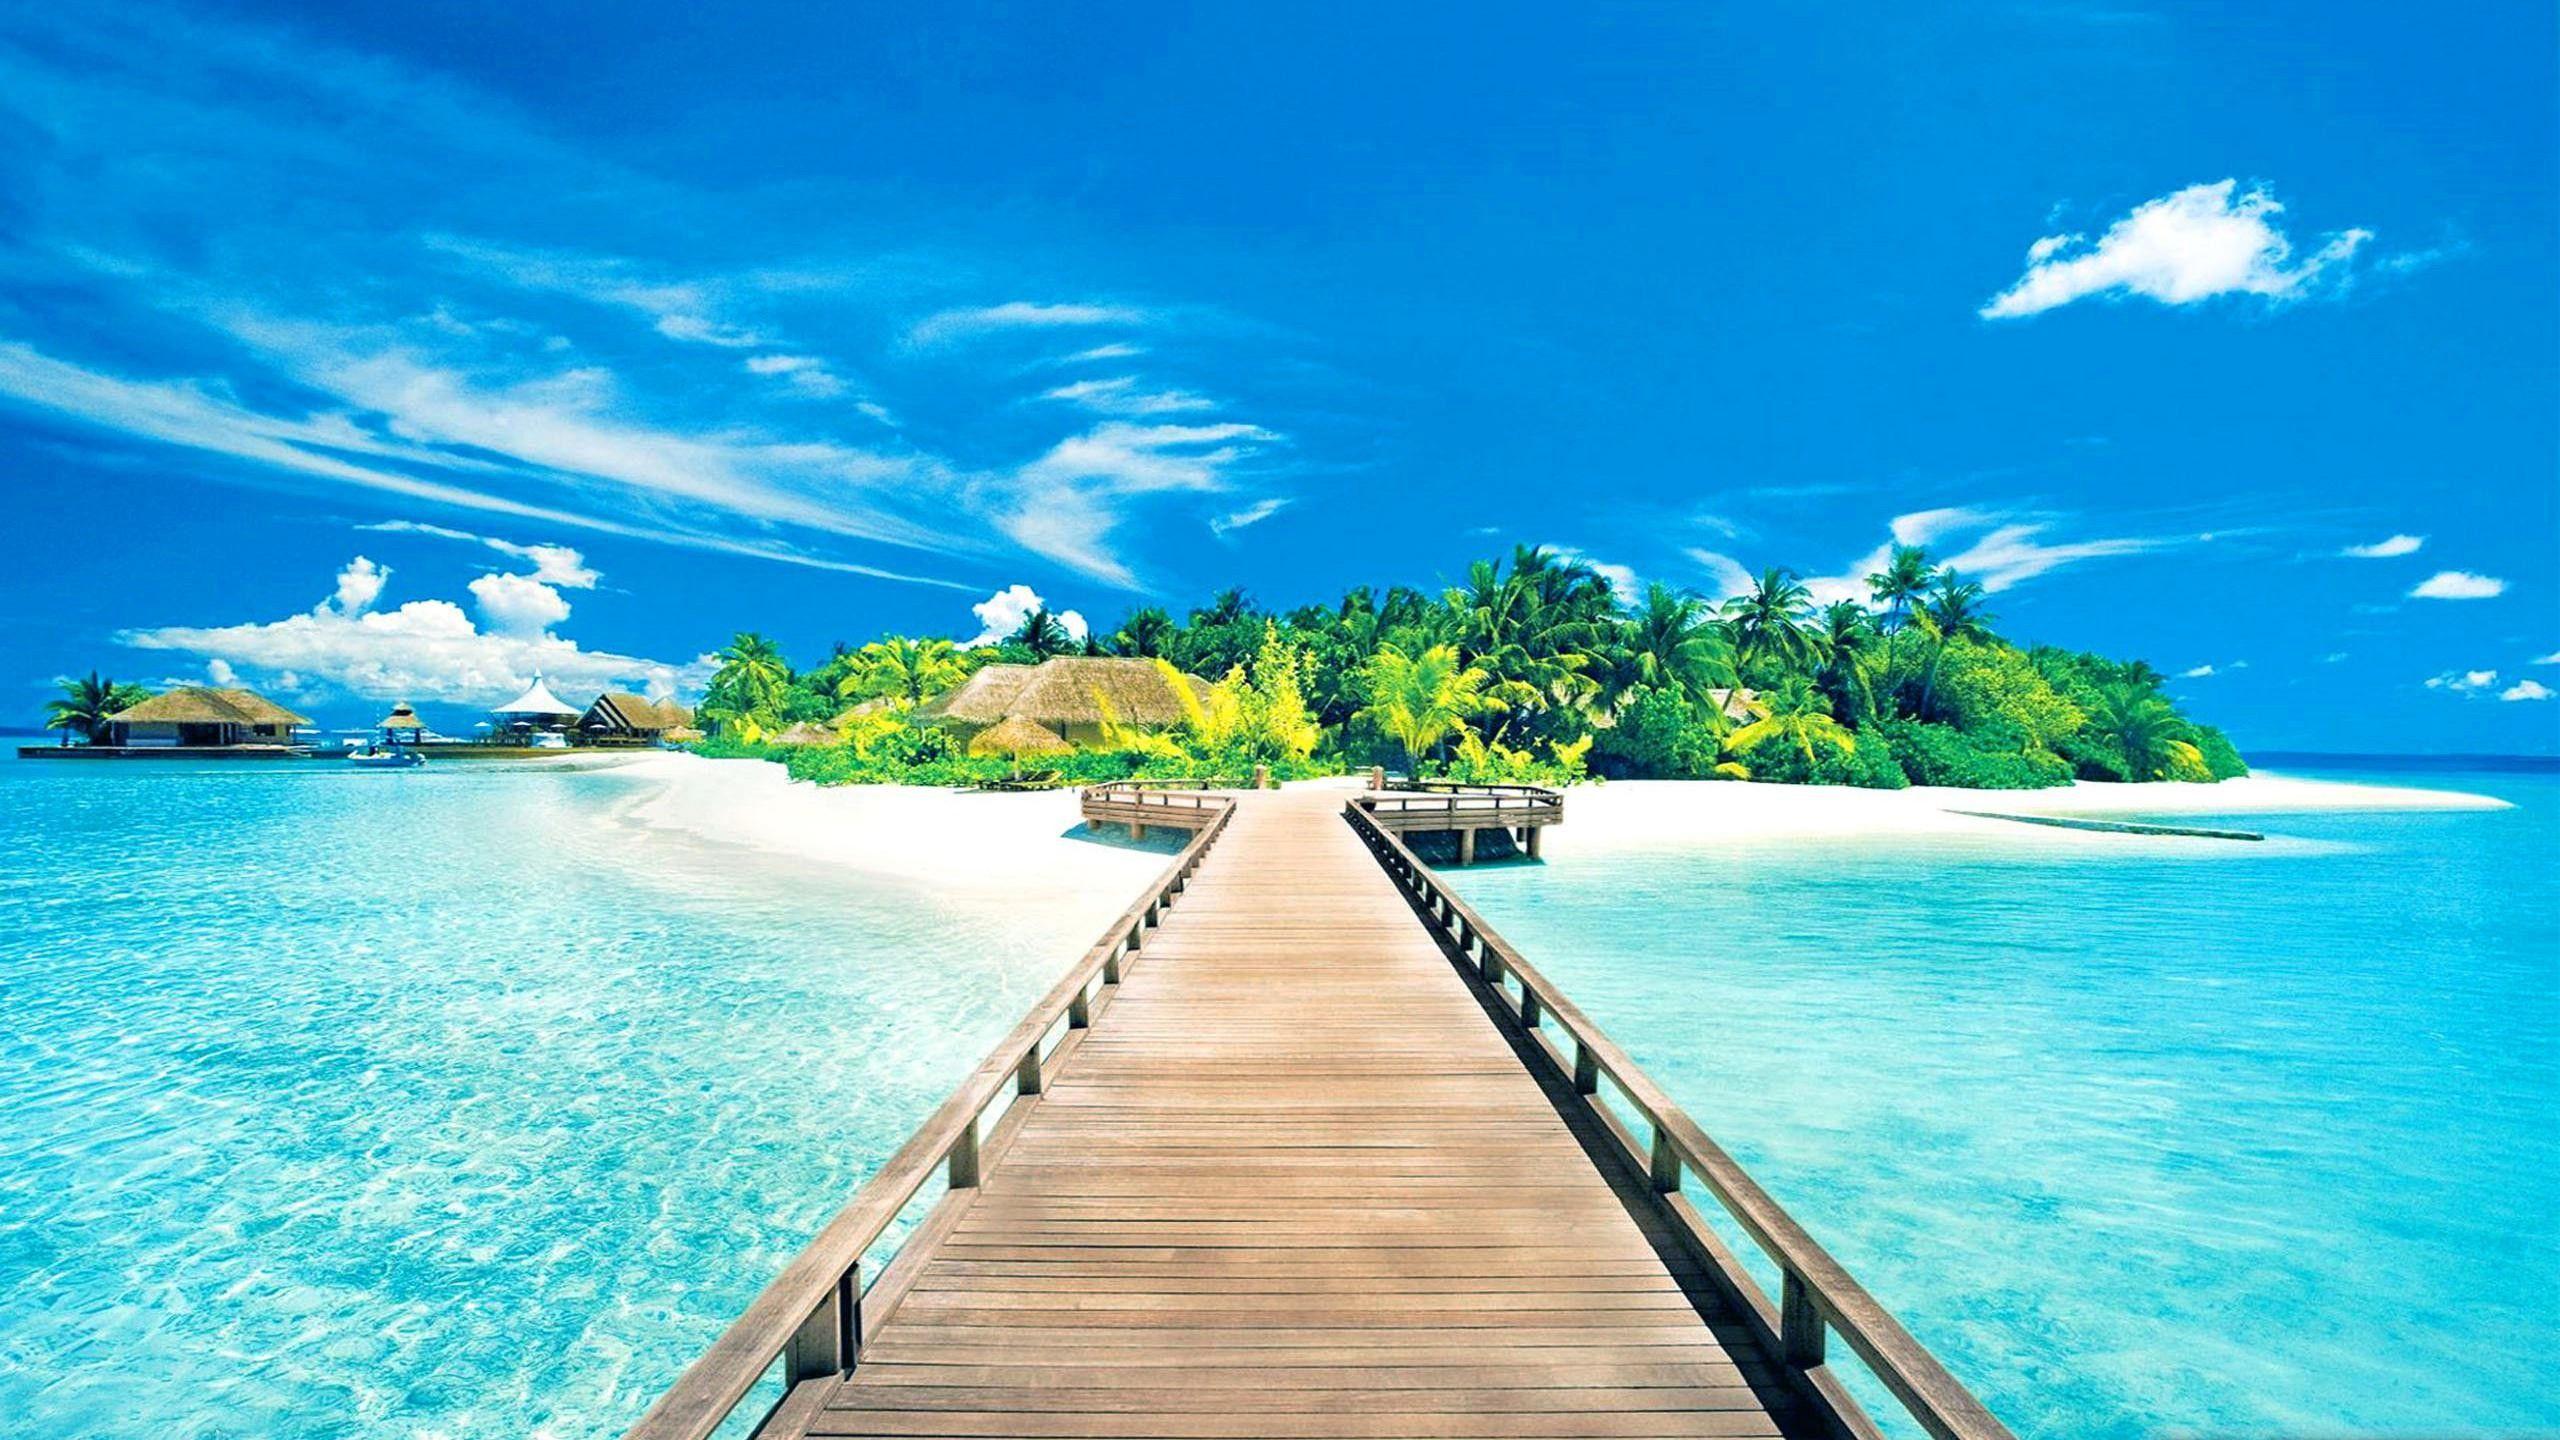 Beautiful Tropical Island Wallpapers   Top Beautiful Tropical 2560x1440